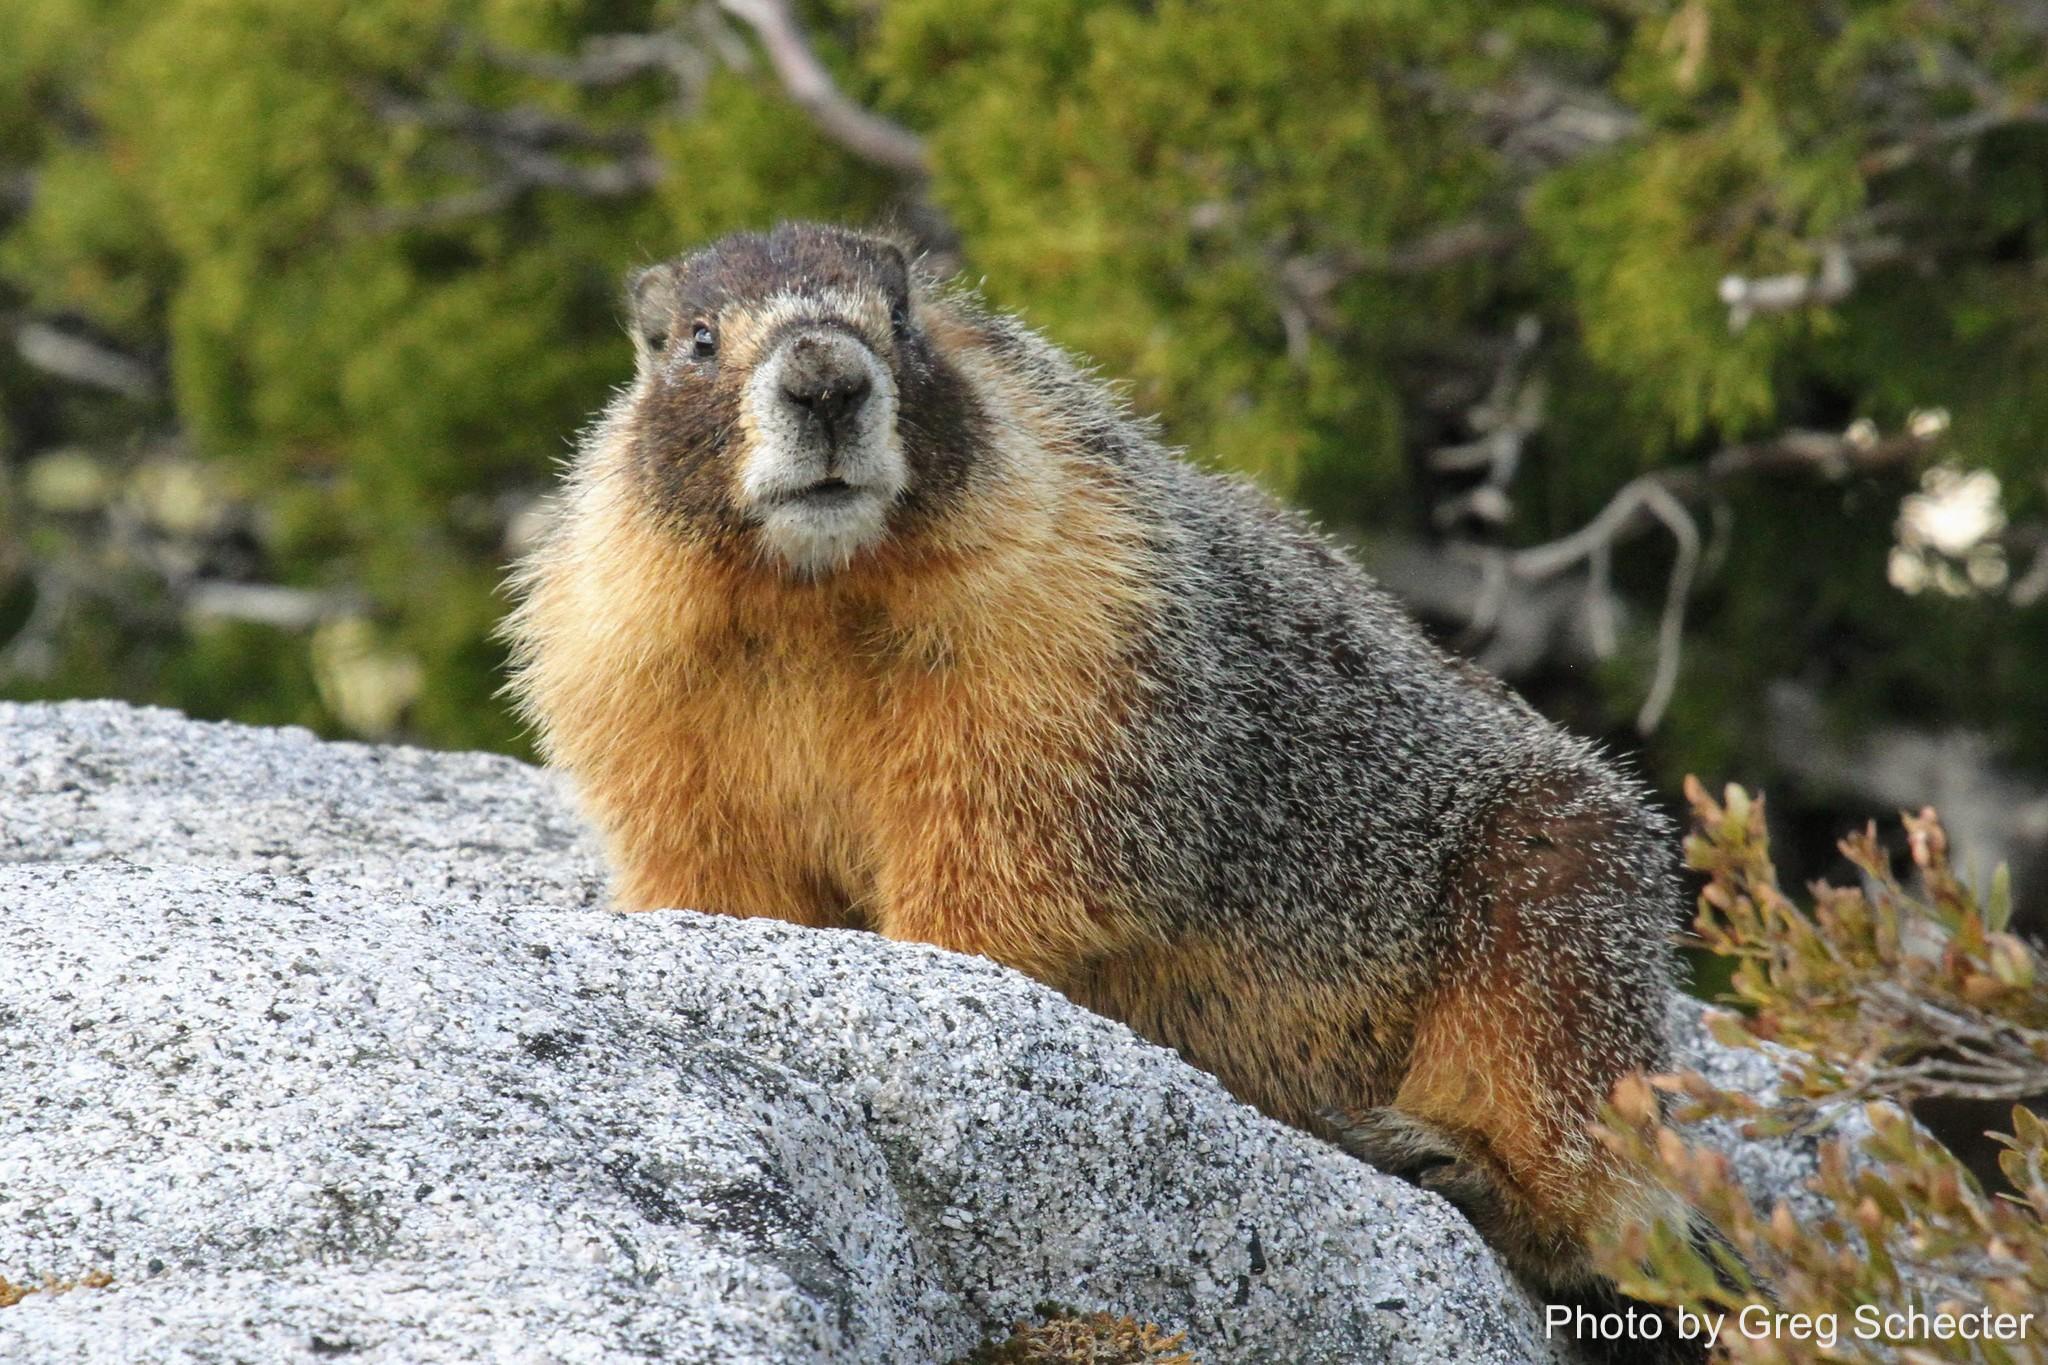 Yellow bellied marmot_Greg Schecter